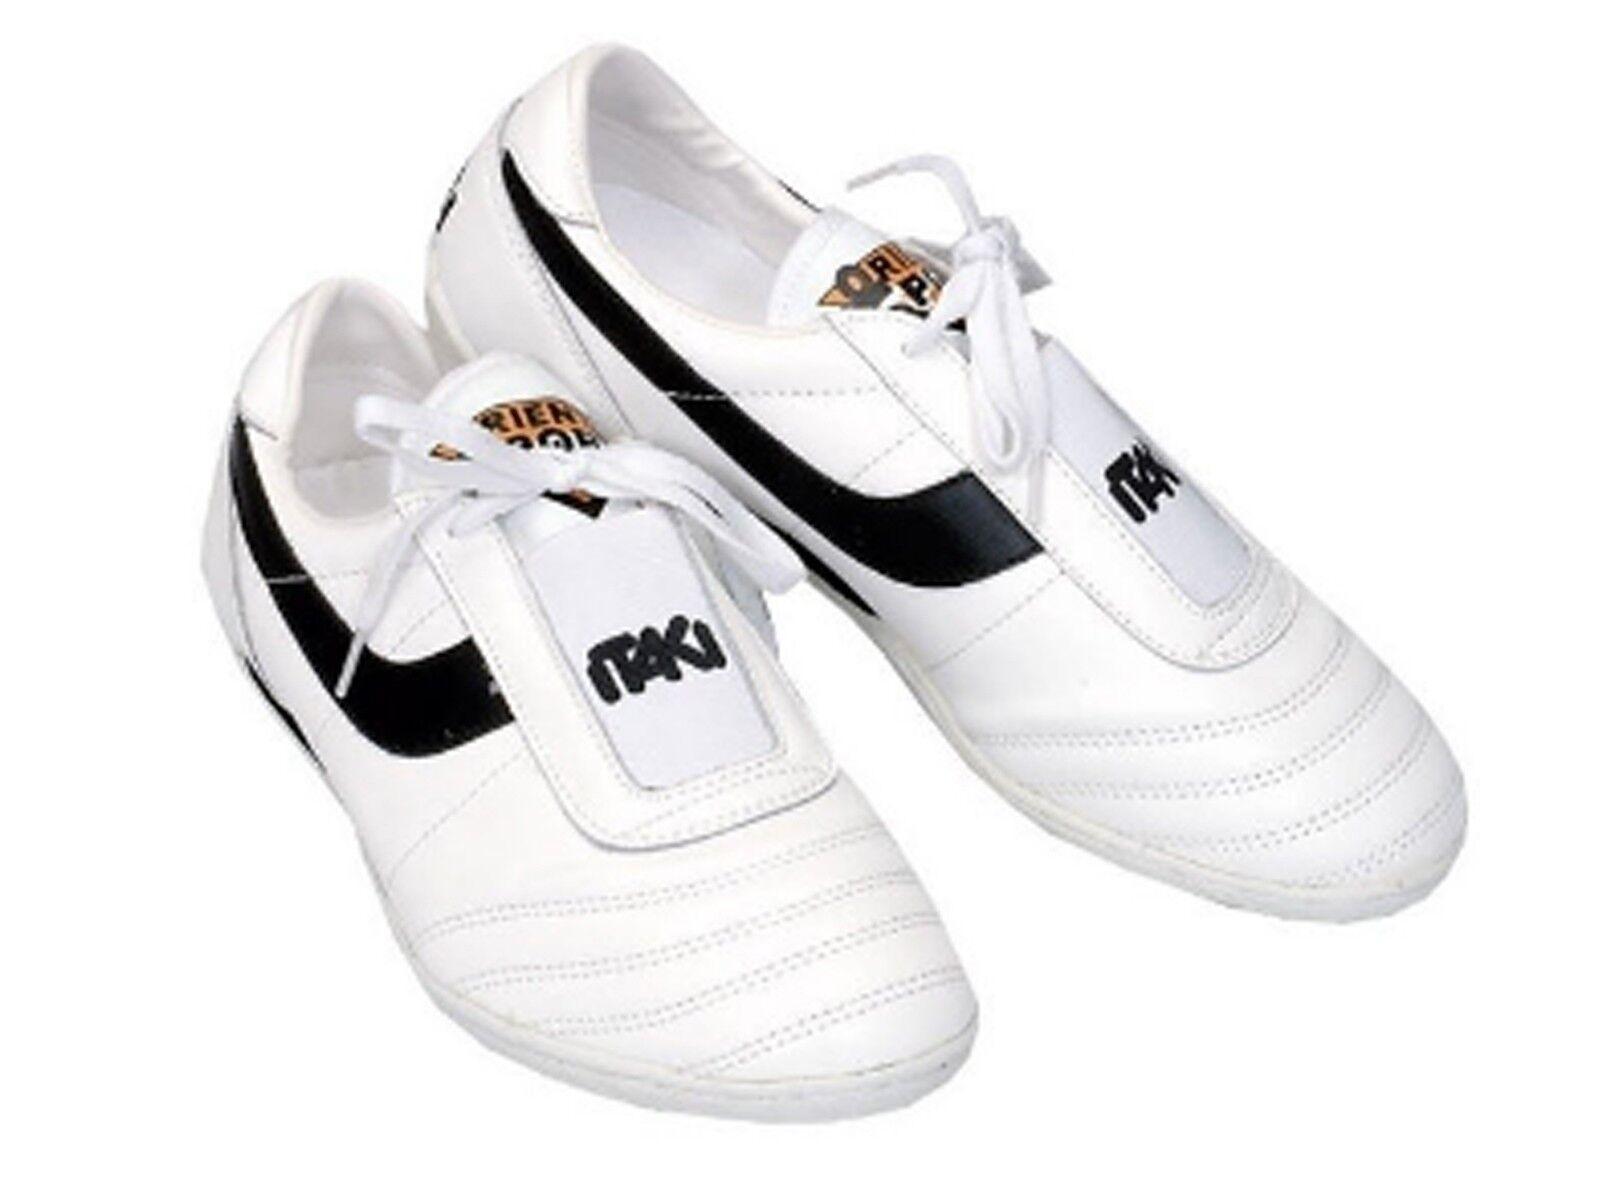 Schuhe  ITAKI  84 B KARATE TAEKKWONDO BIANCO